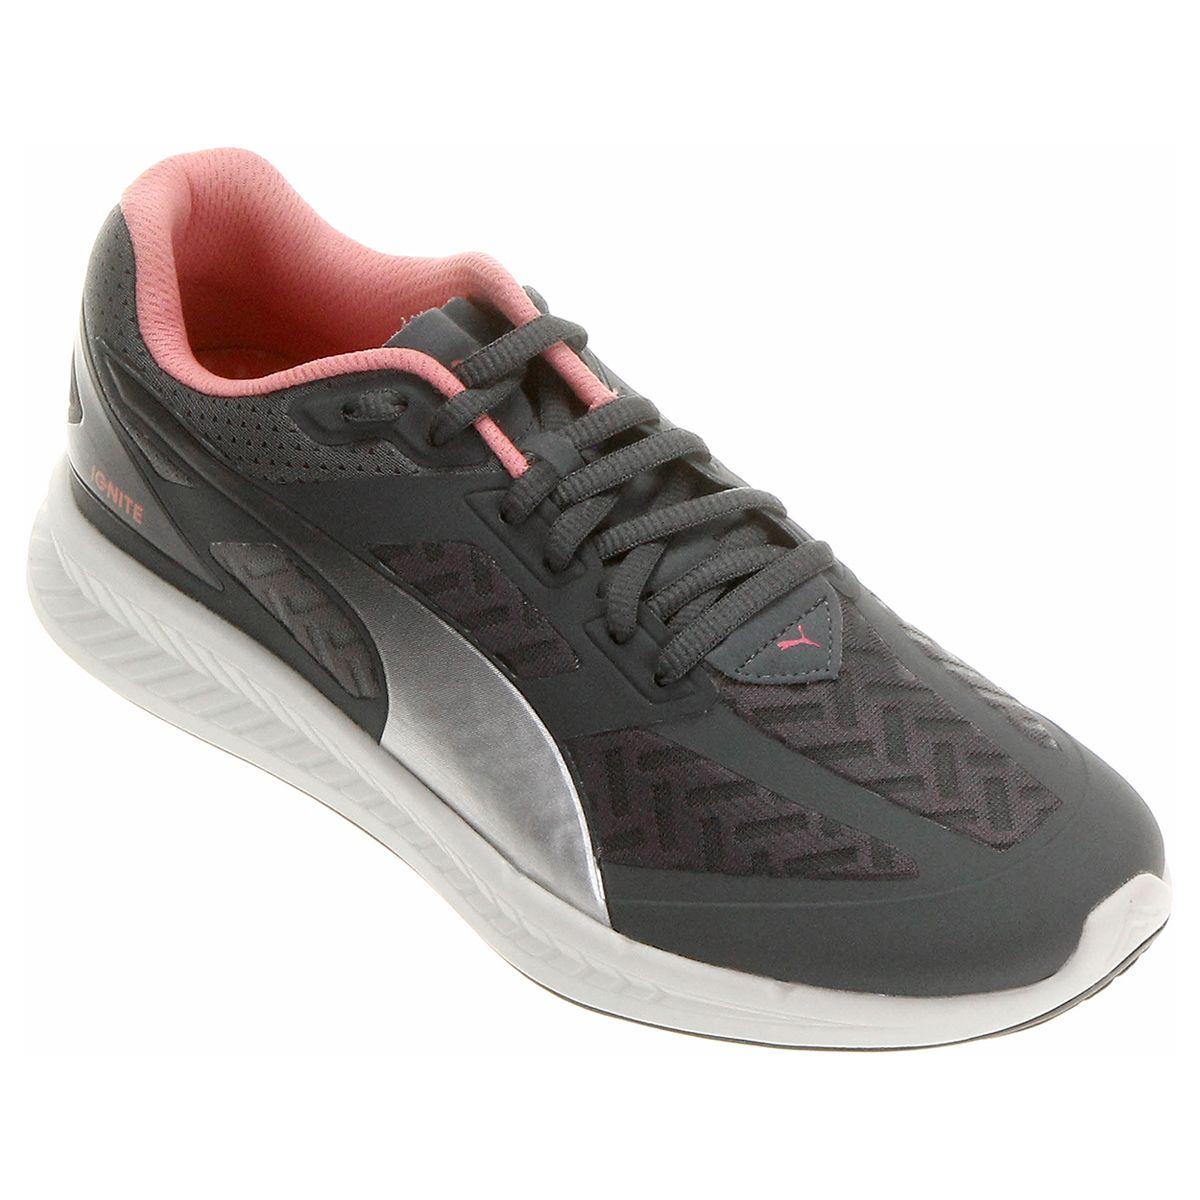 86de63e1a4d54 Tênis Puma Ignite Powercool Feminino Chumbo e Pink   Netshoes ...